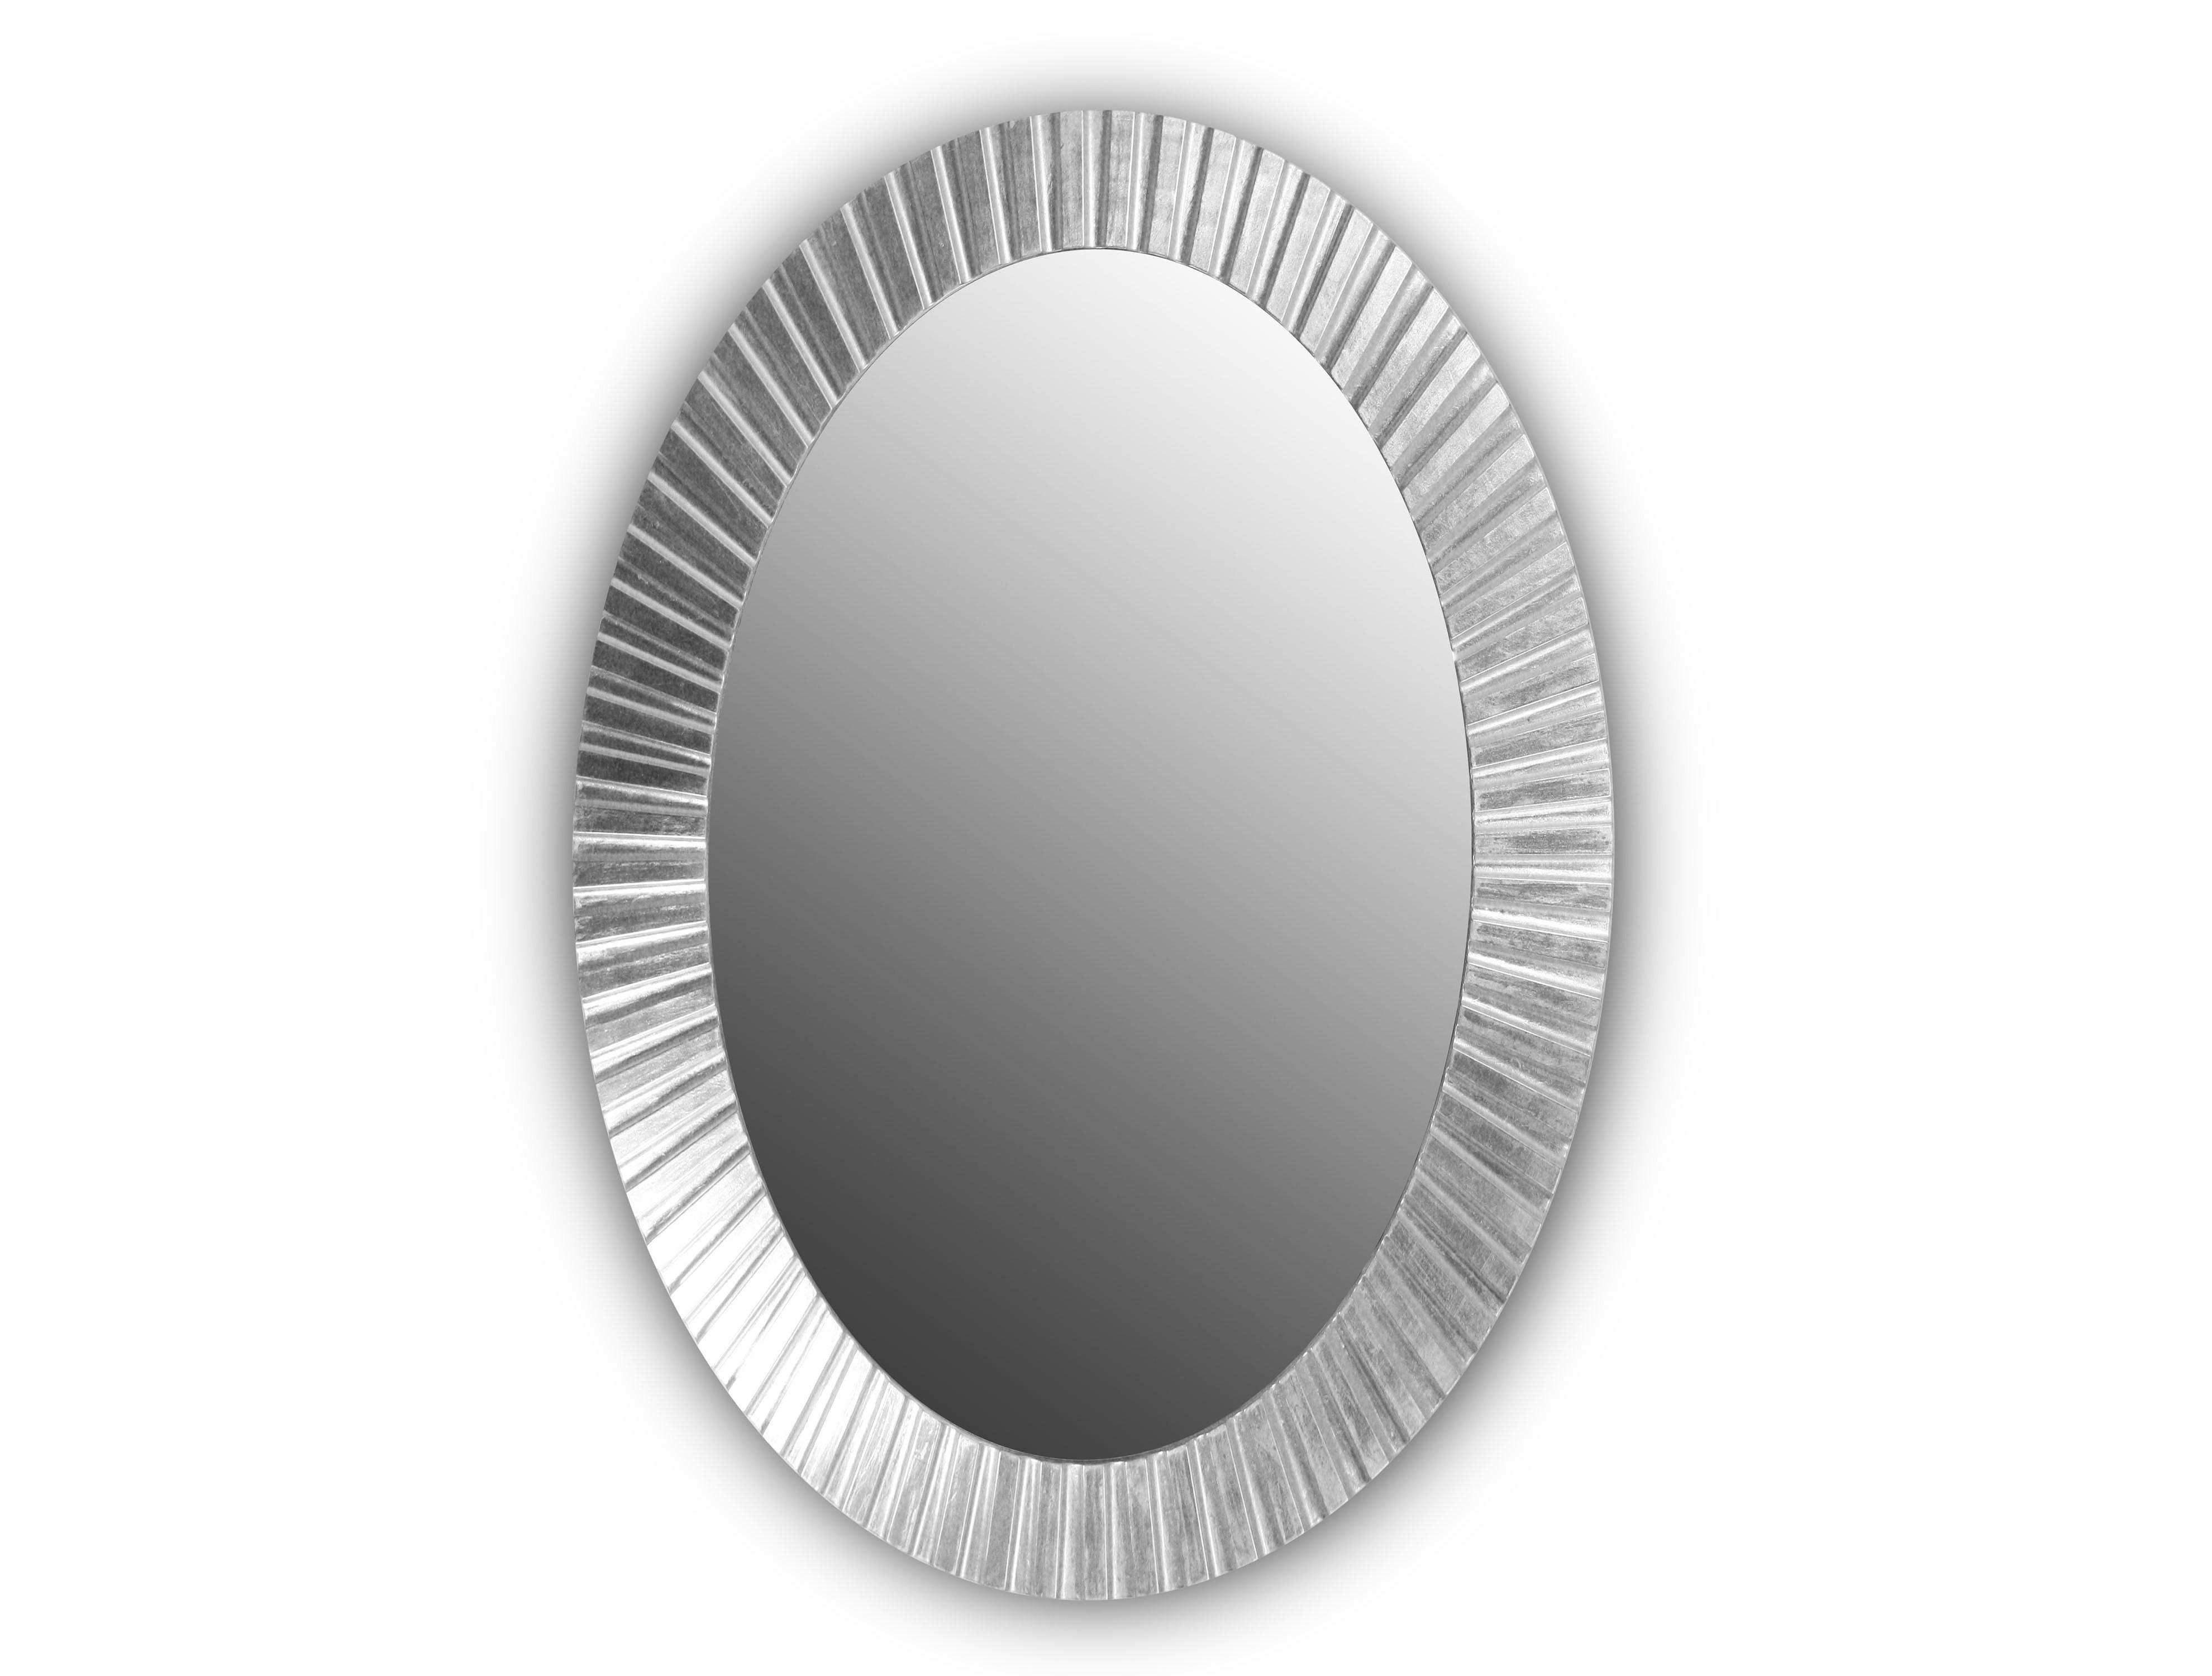 Зеркало Fashion indioНастенные зеркала<br>&amp;amp;nbsp;Патина, поталь<br><br>Material: Дерево<br>Ширина см: 90.0<br>Высота см: 90.0<br>Глубина см: 3